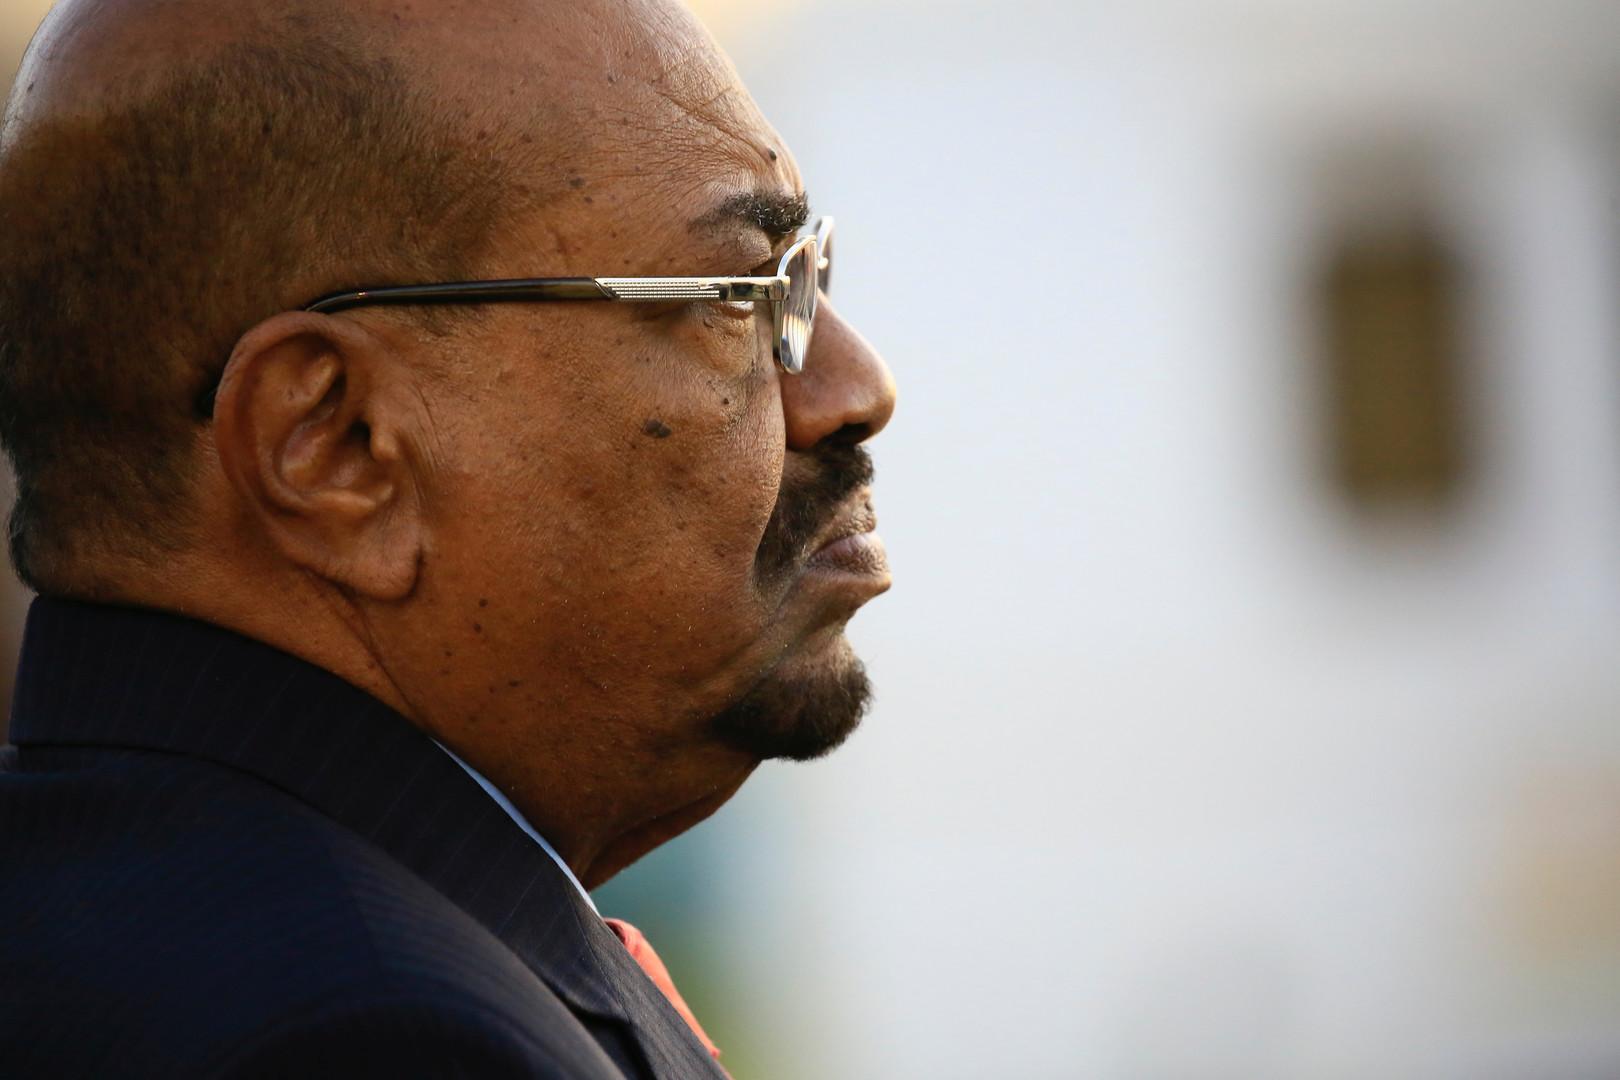 السودان.. ﺍﻟﺒﺸﻴﺮ ﻳﻜﺜﺮ ﻣﻦ ﺍﻟﻘﻔﺸﺎﺕ ﻭﺍﻟﻀﺤﻜﺎﺕ